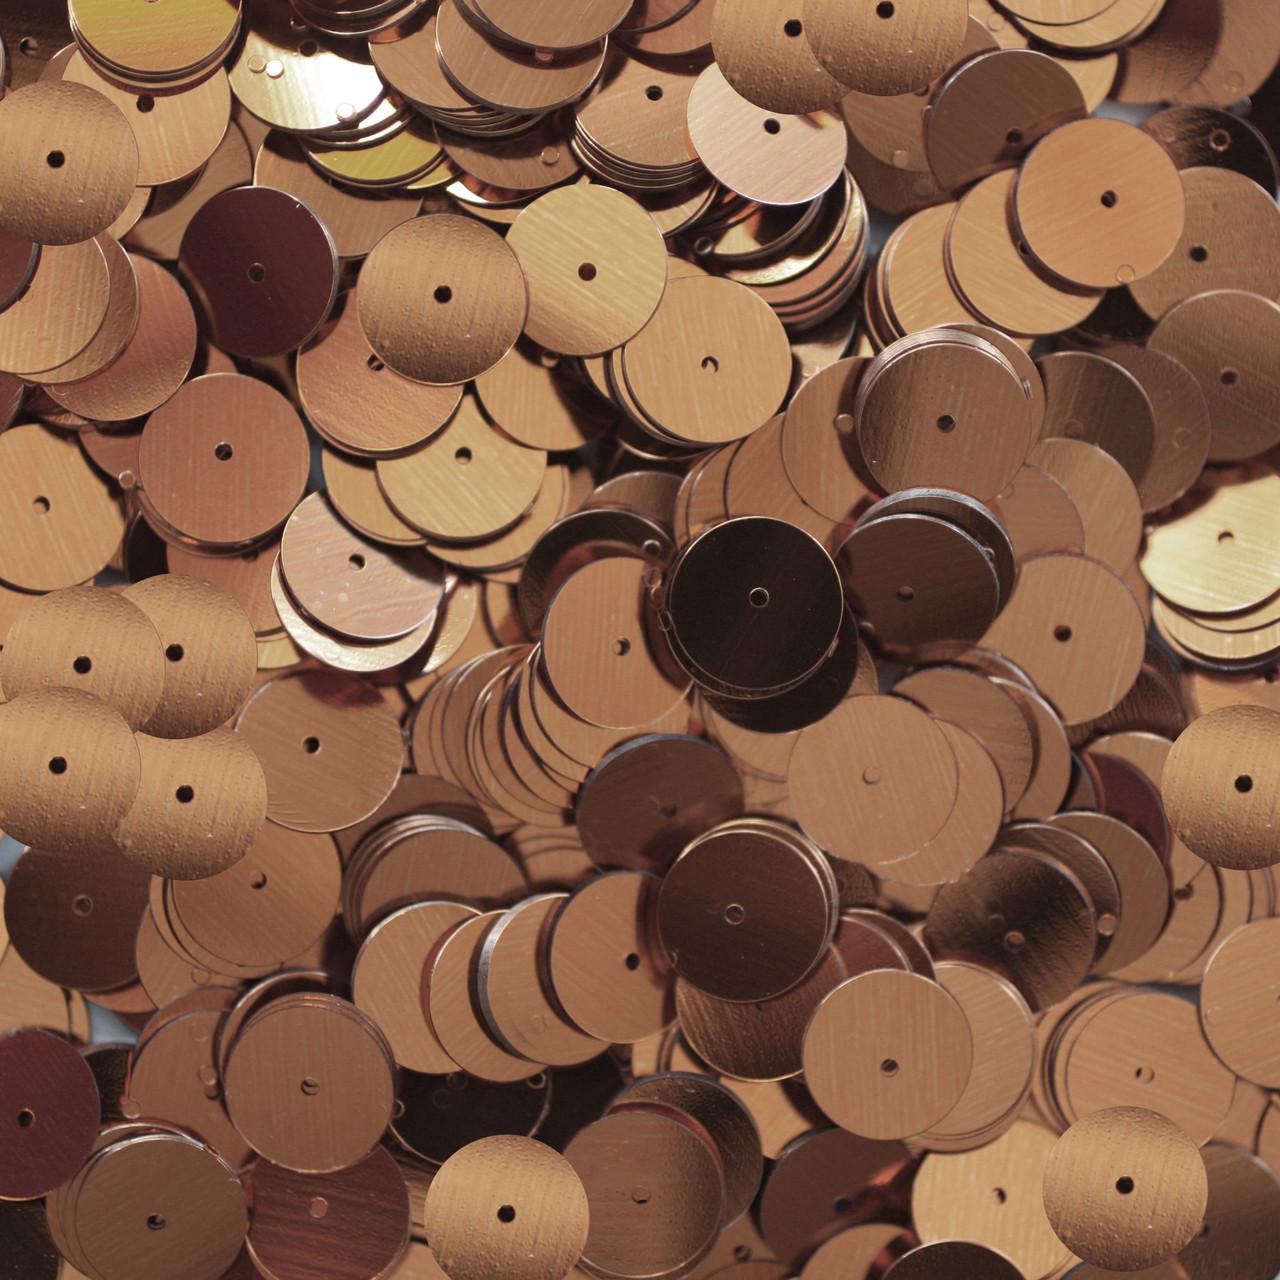 10mm Flat Round Sequins Copper Shiny Metallic